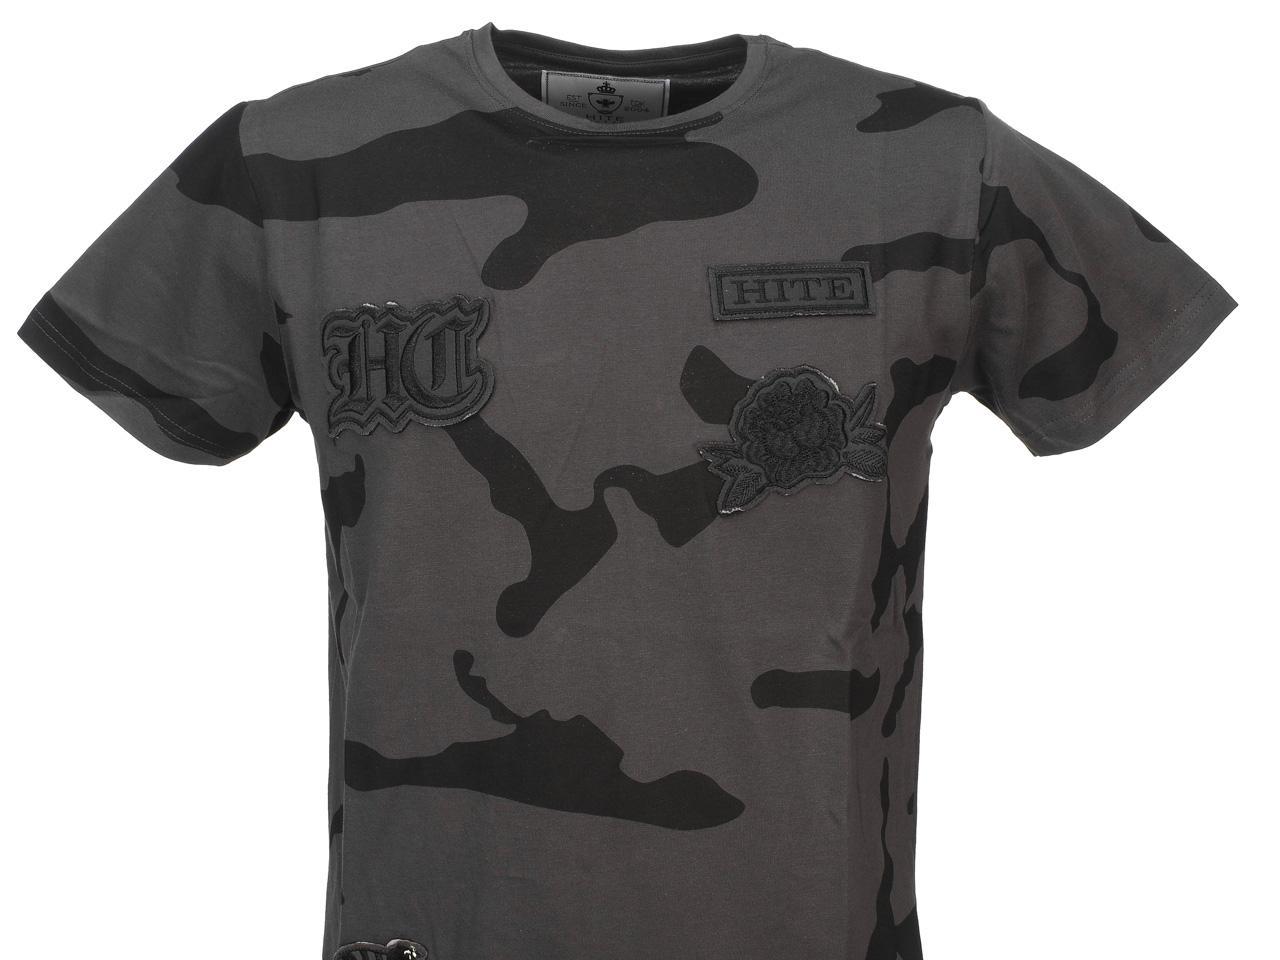 Short-Sleeve-T-Shirt-Hite-Couture-bet-Camo-Anth-Mc-Tee-Grey-11535-New thumbnail 2